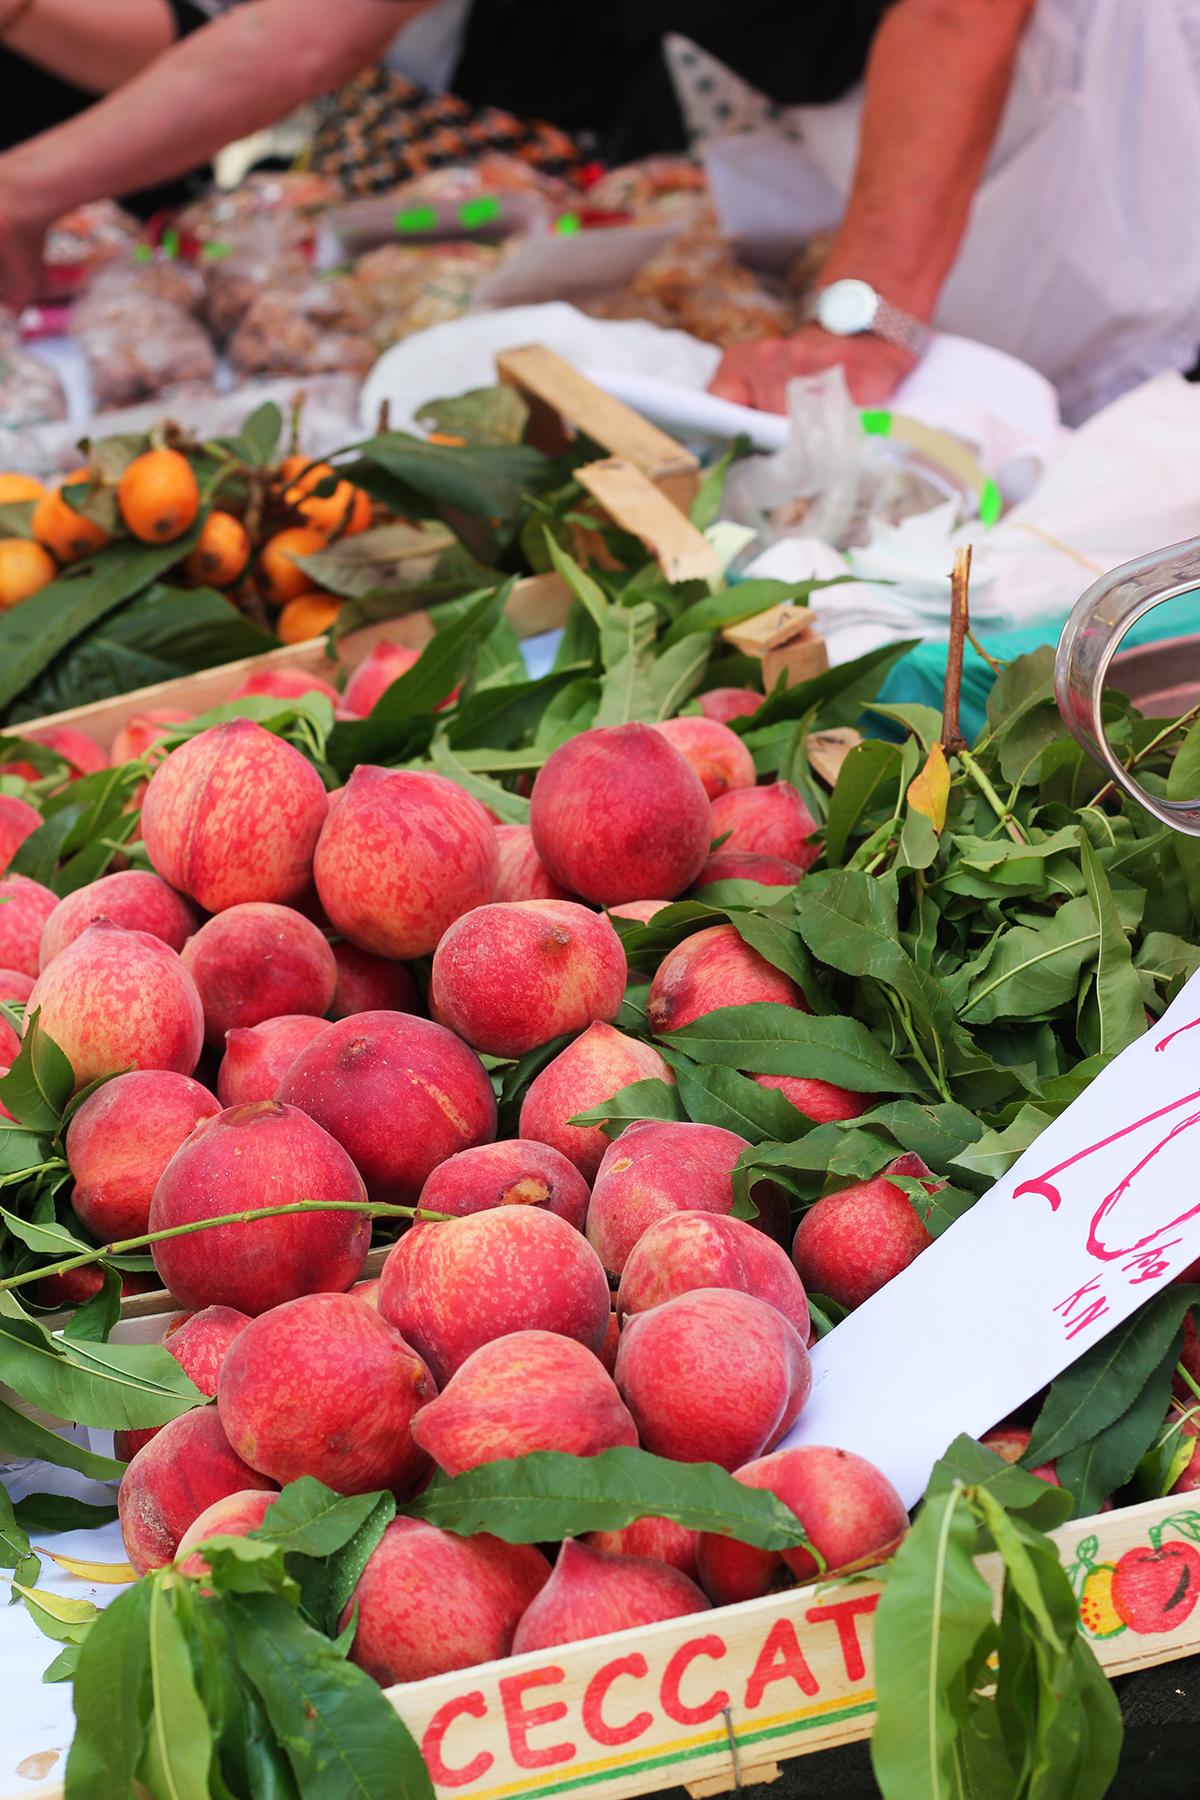 pjaca dubrovnik green market organic food go dubrovnik market in Dubrovnik